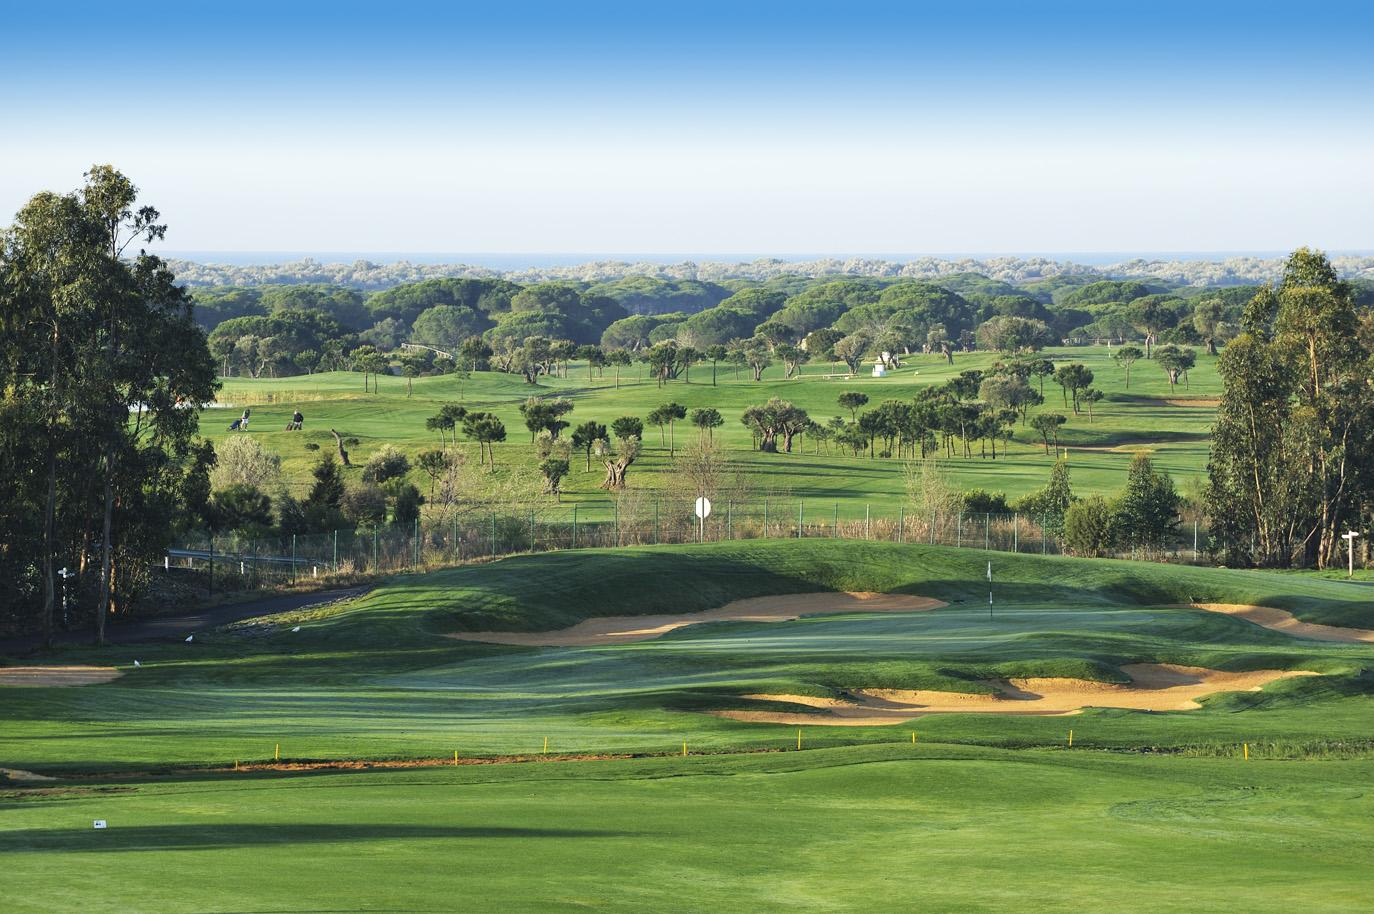 Golfreise nach Portugal - Ladiesweek